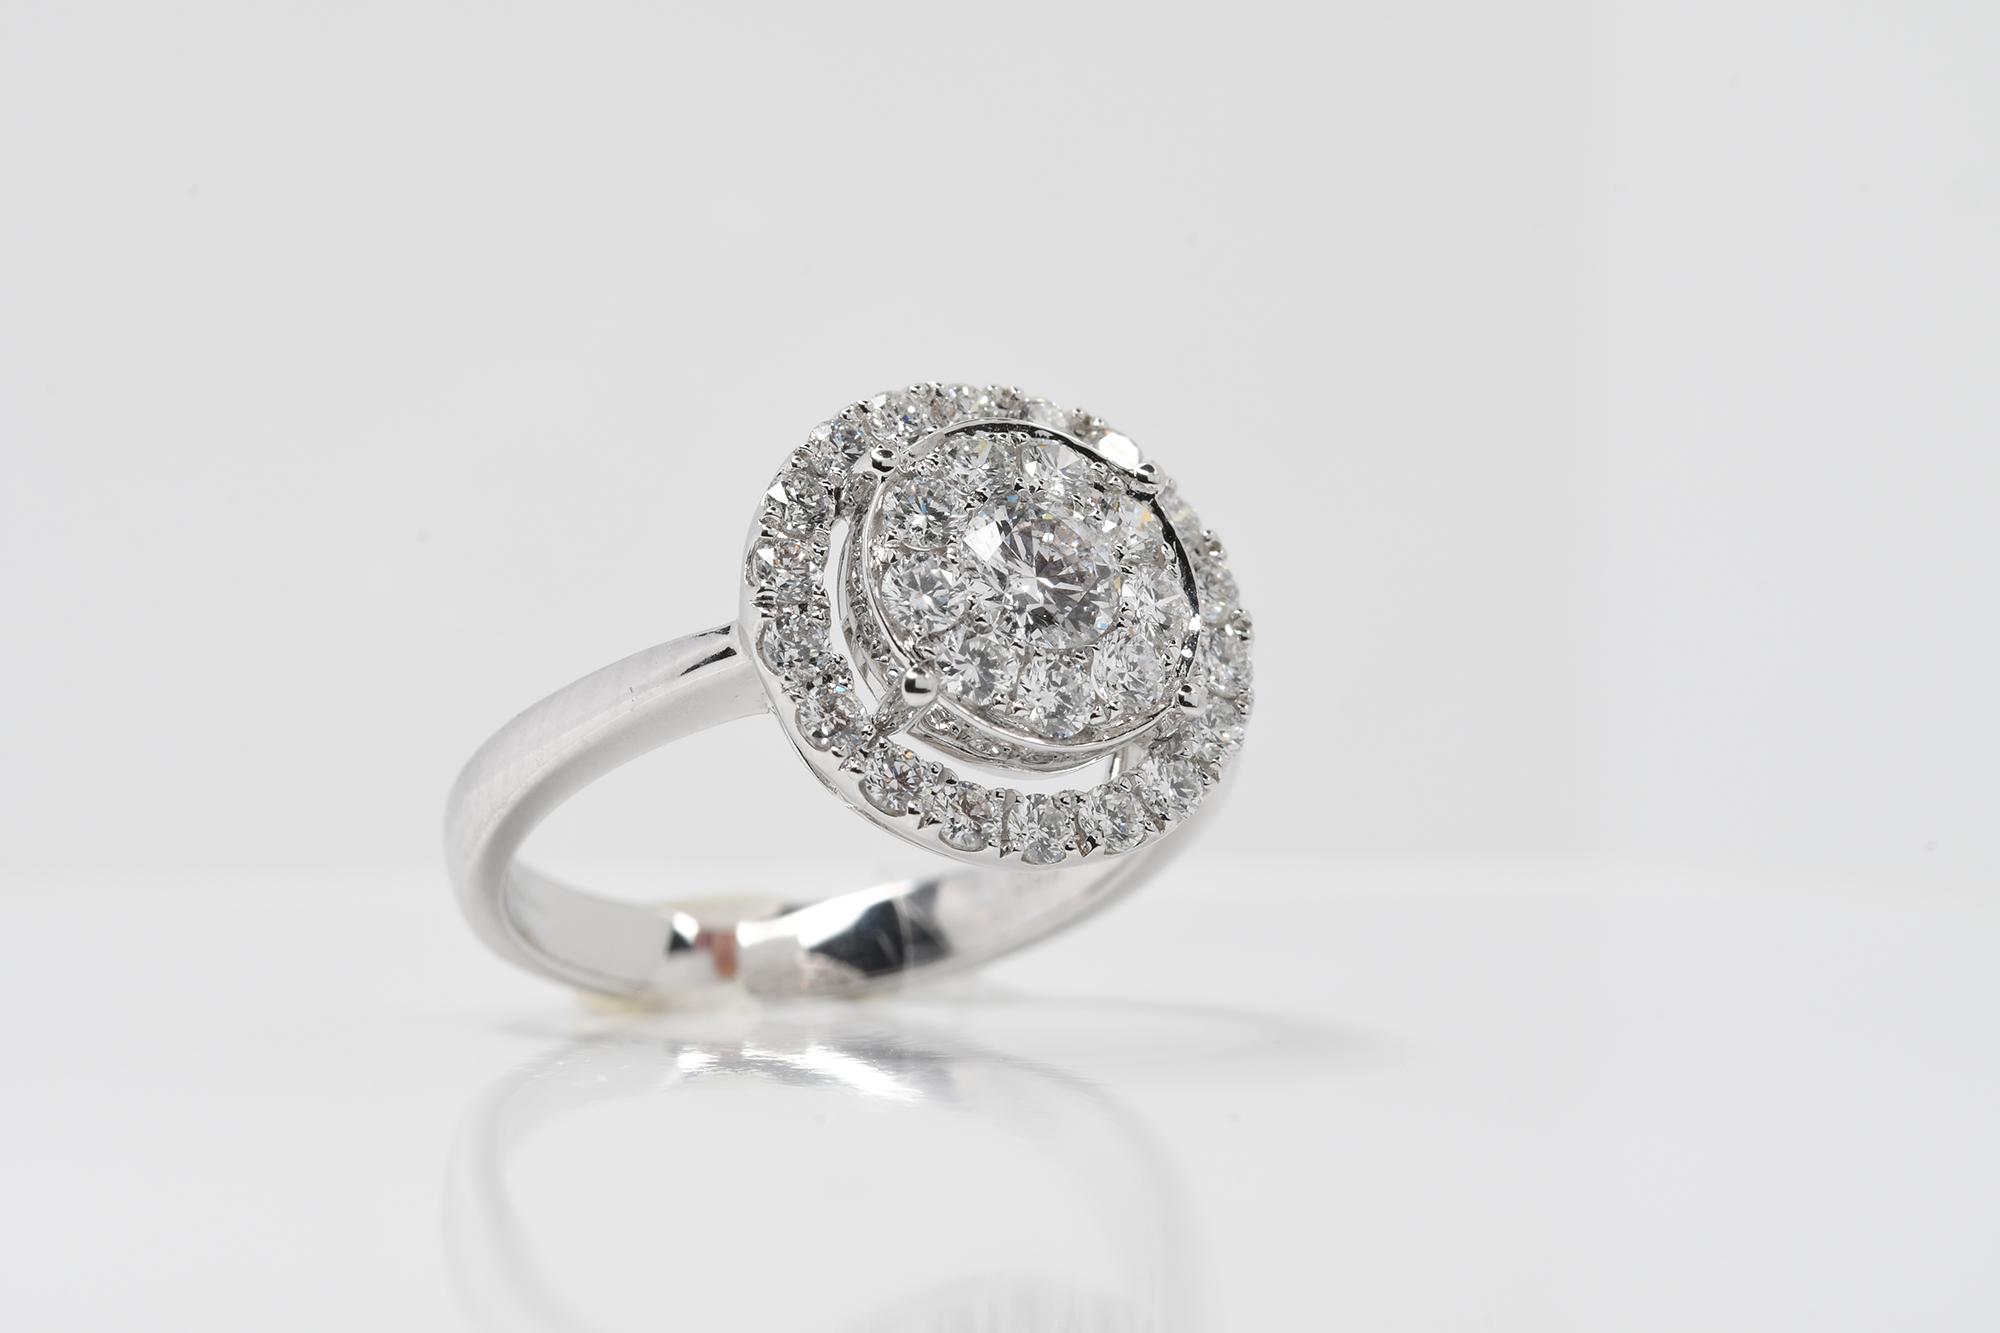 Diamond Ring - Image 4 of 5